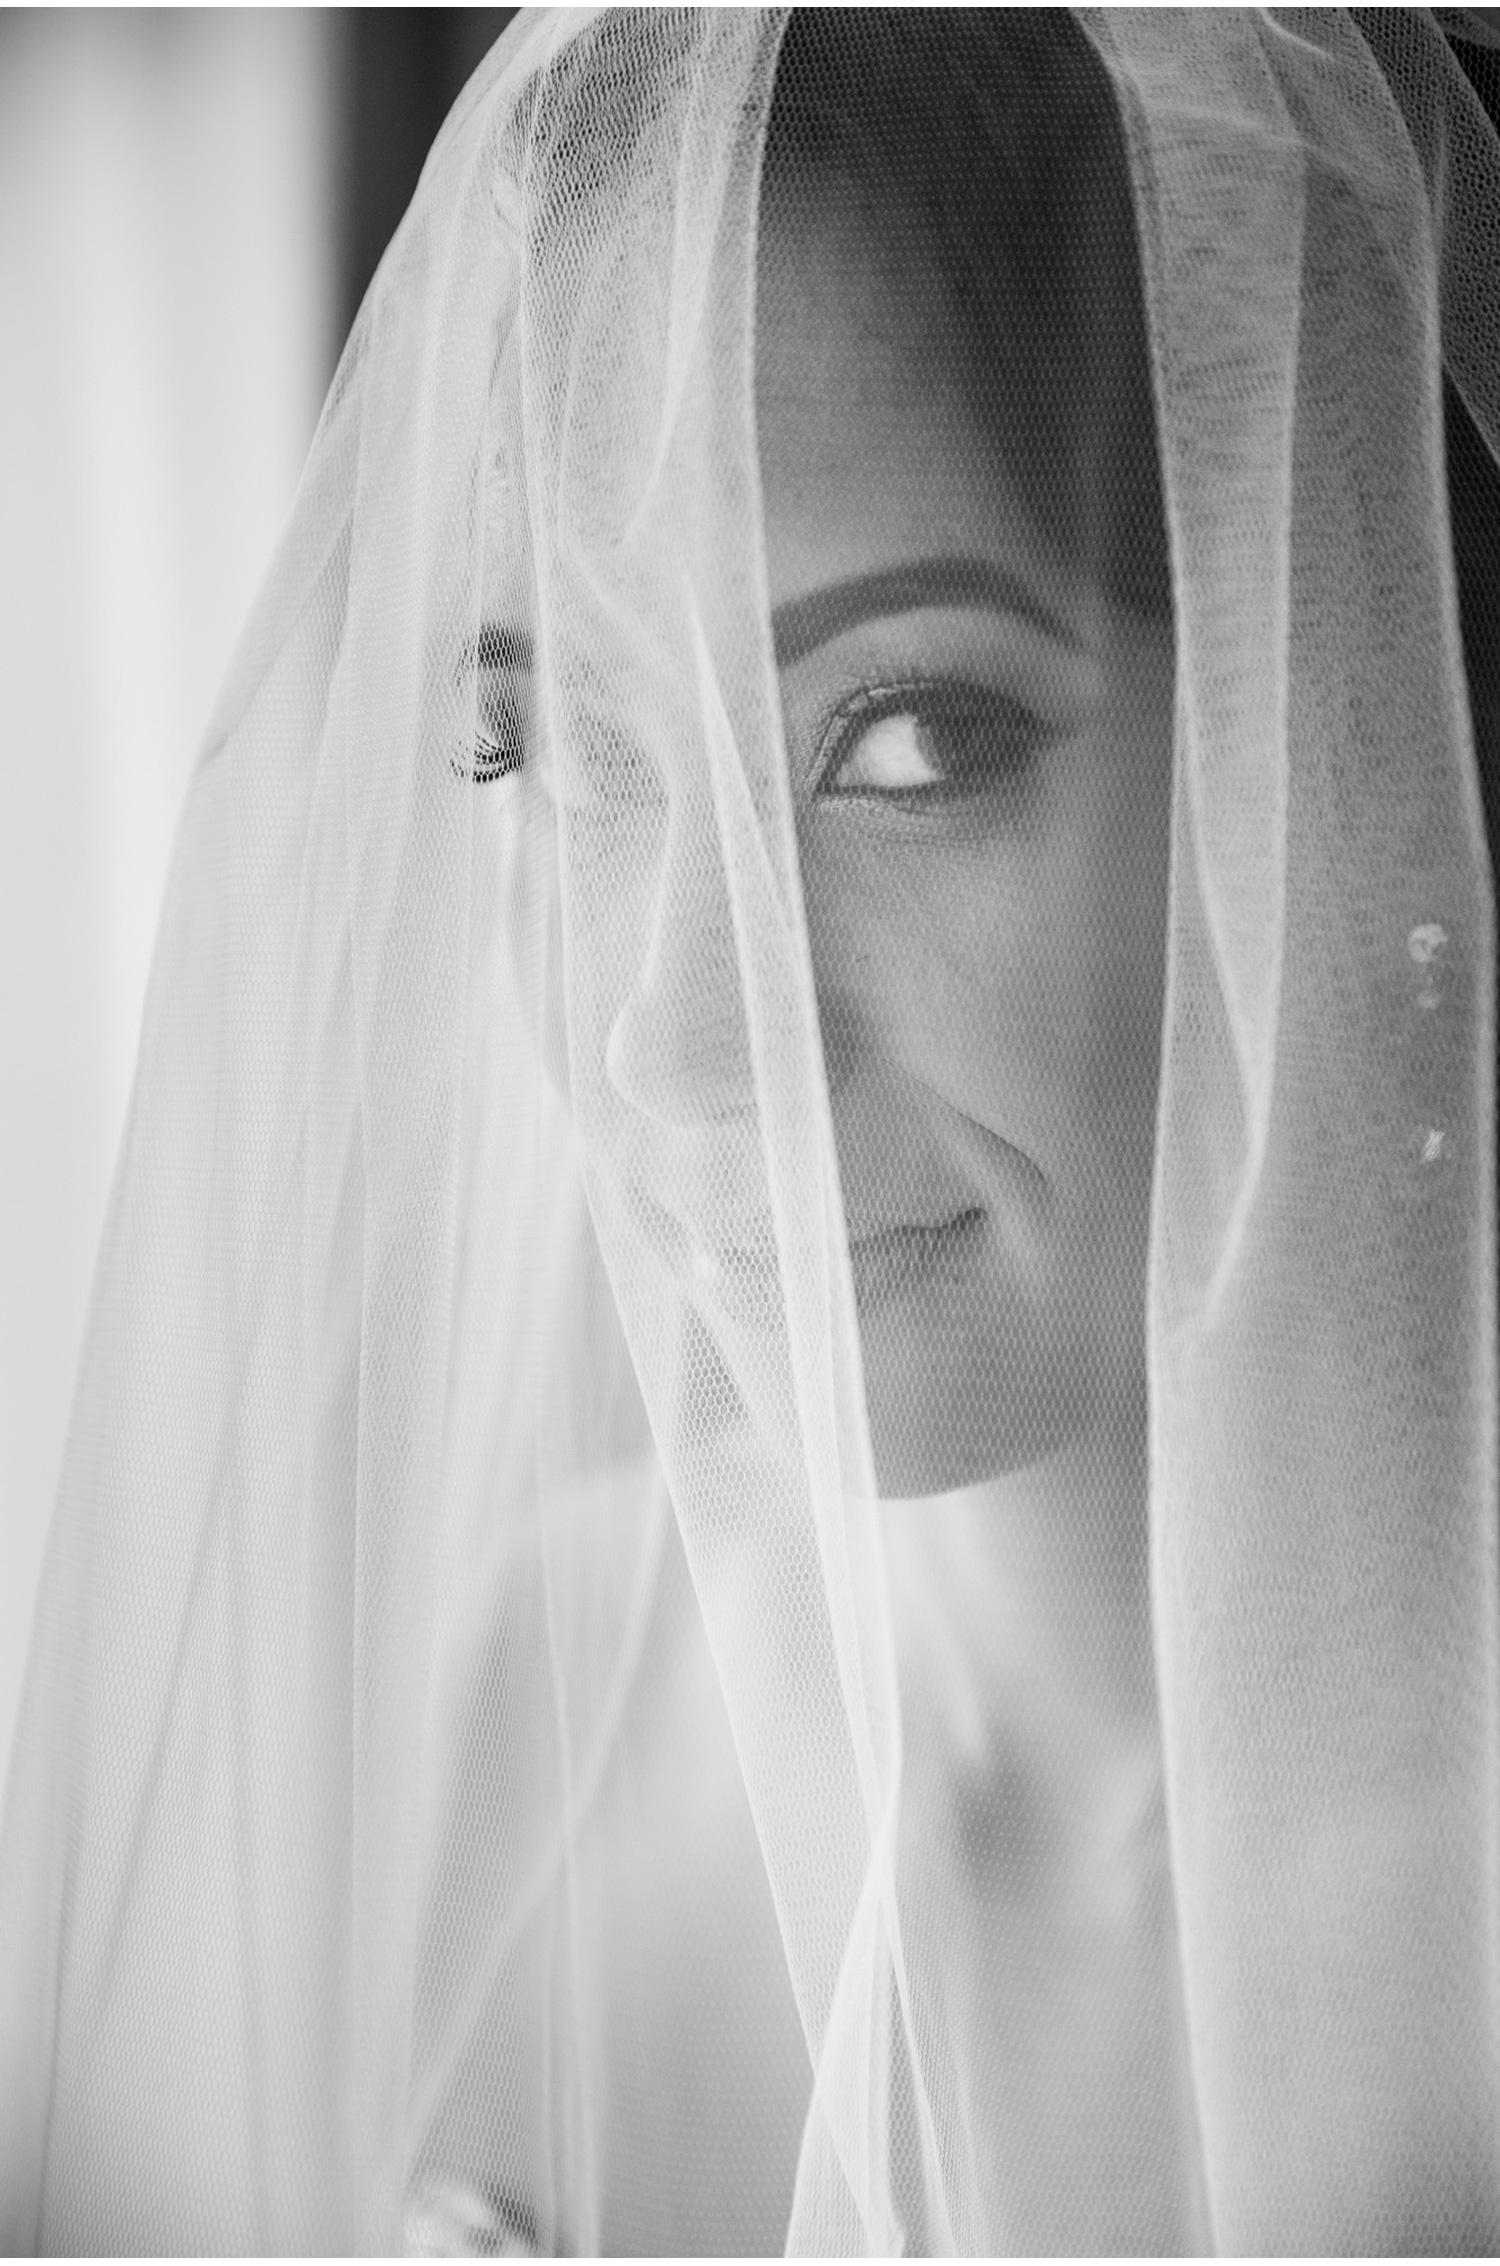 085-andrew-rankin-townsville-wedding-photography.jpg